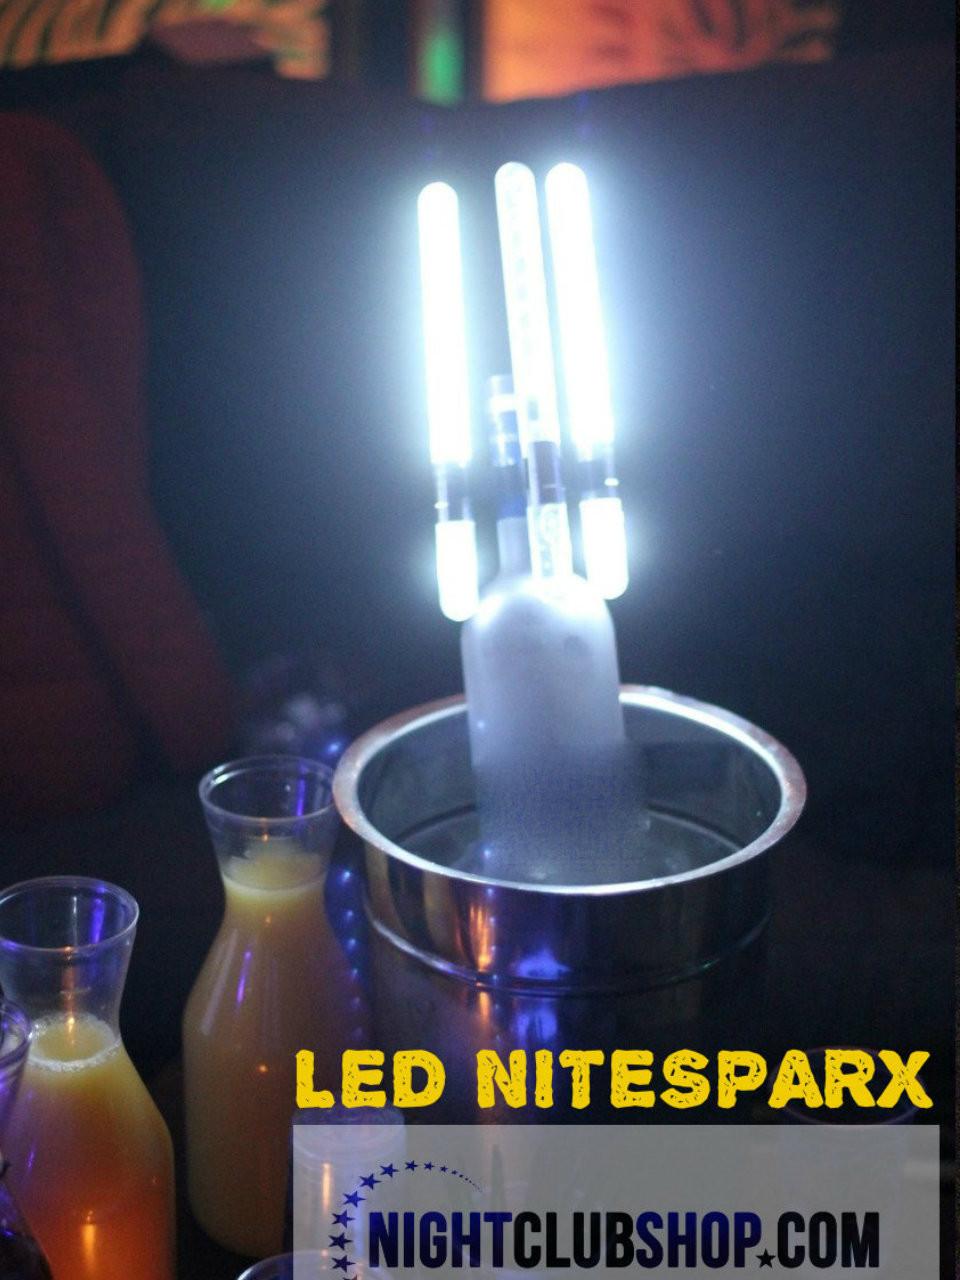 LED, Nitesparx, Nite sparx, Electronic, champagne, Bottle, Sparklers